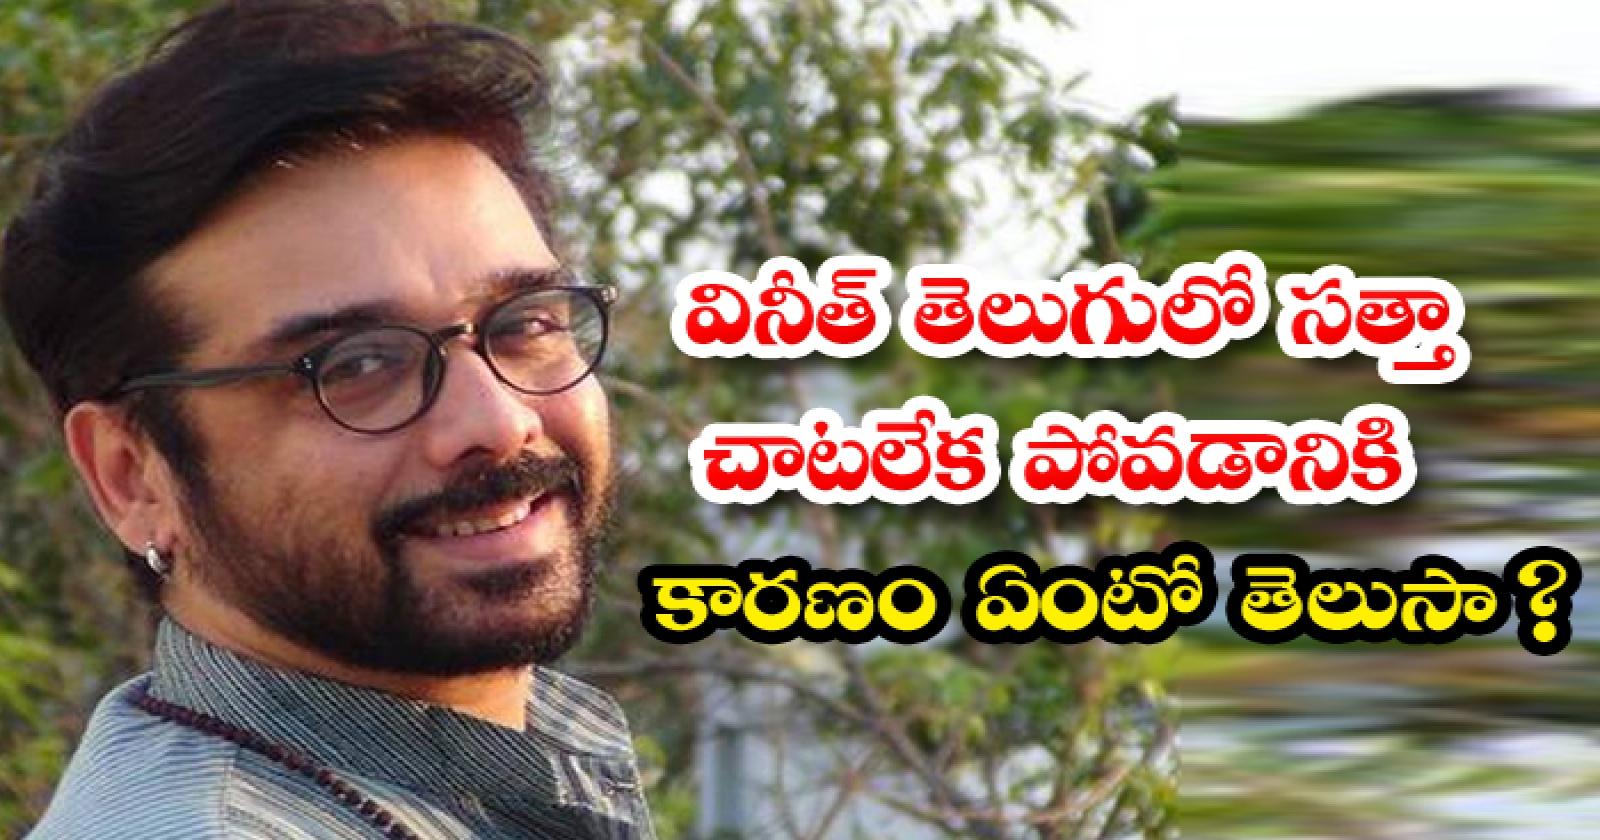 What Are The Reasons For Hero Vineet Failures-వినీత్ తెలుగులో సత్తా చాటలేక పోవడానికి కారణం ఏంటో తెలుసా-Latest News - Telugu-Telugu Tollywood Photo Image-TeluguStop.com